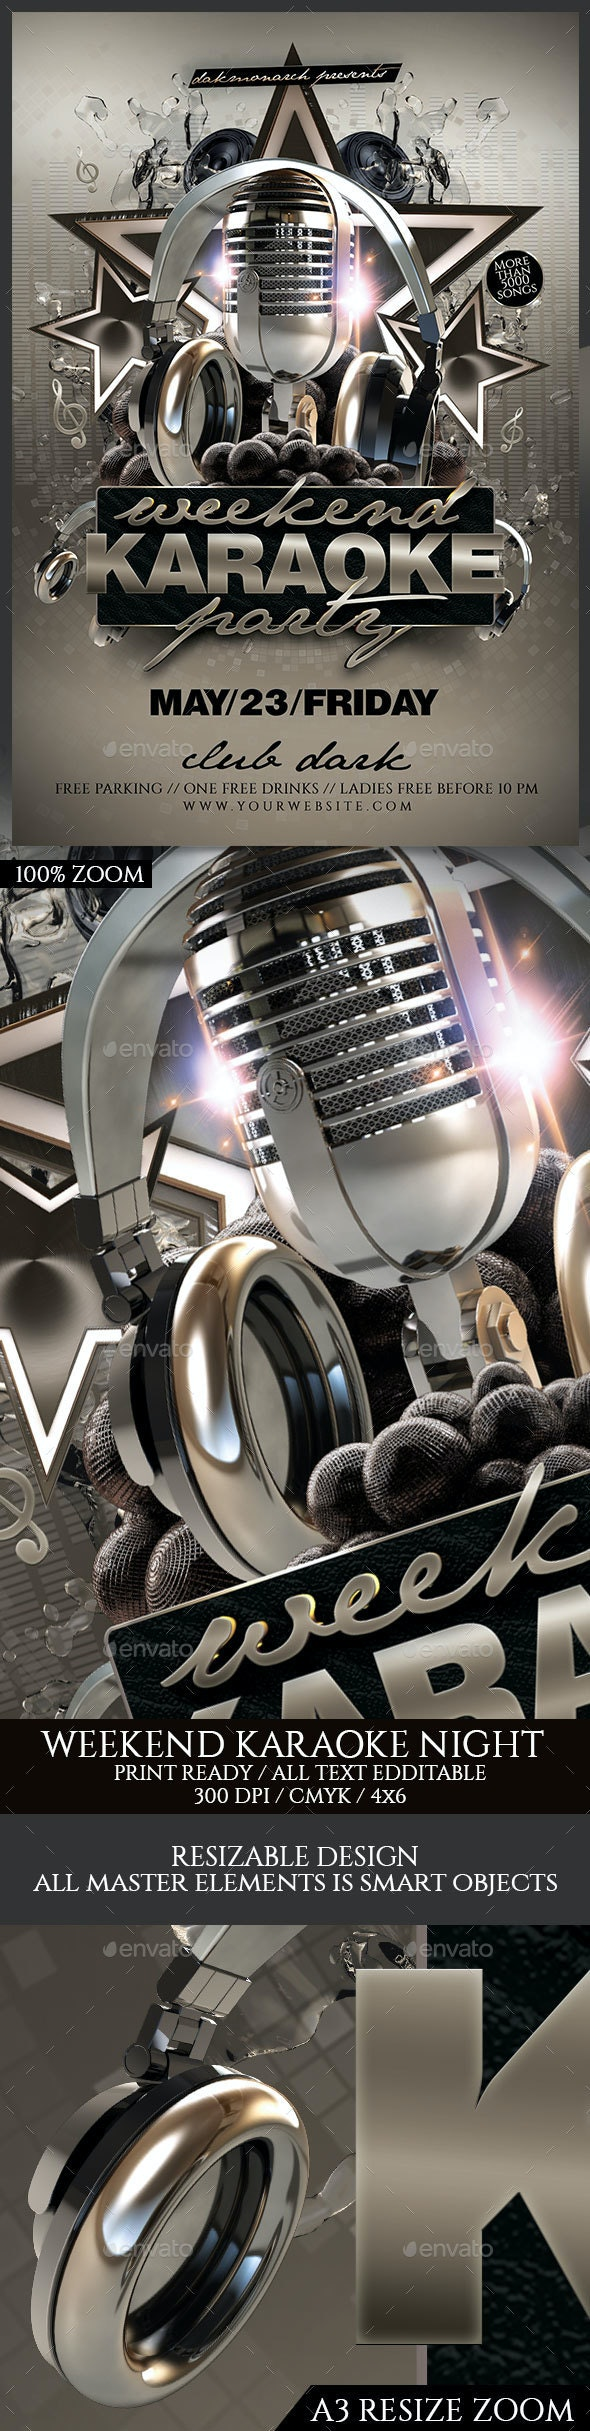 Weekend Karaoke Night - Events Flyers